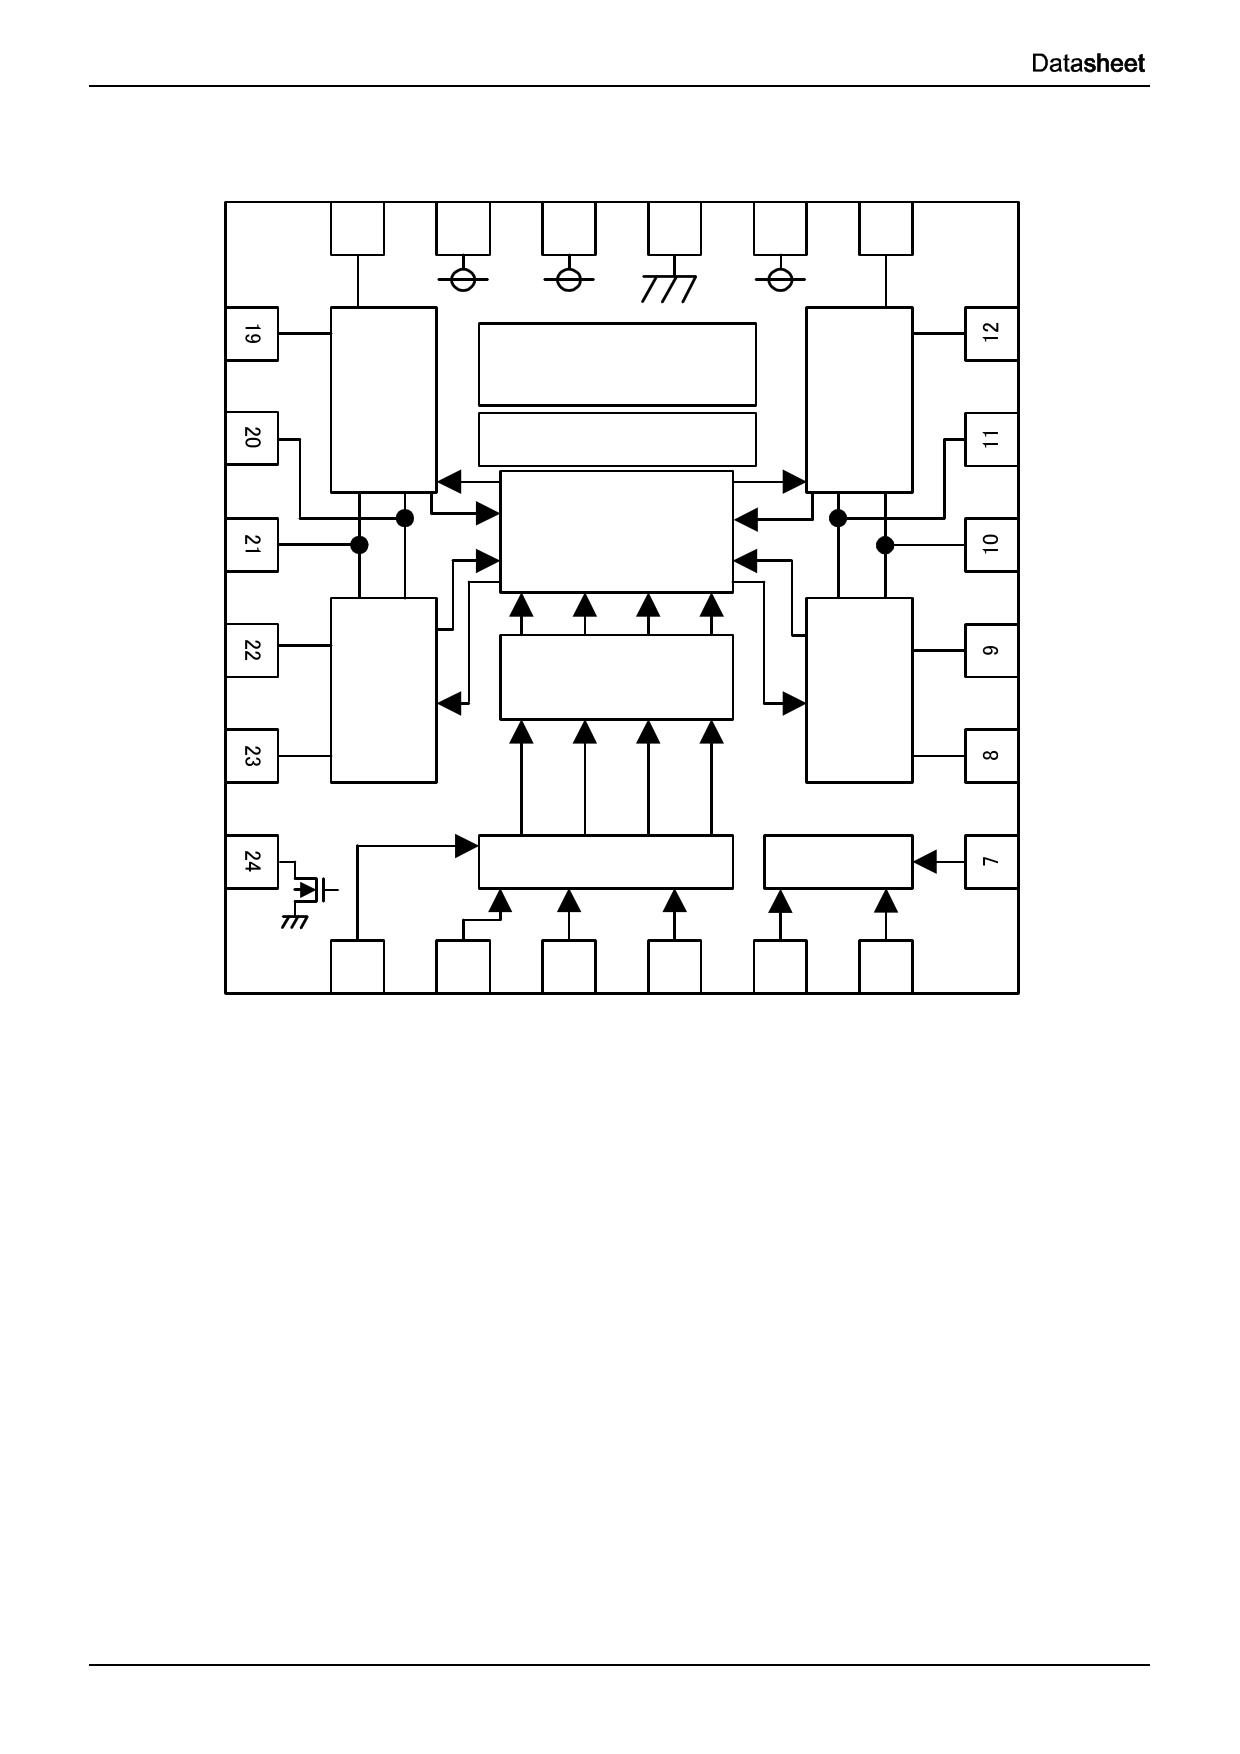 BD28620MUV pdf